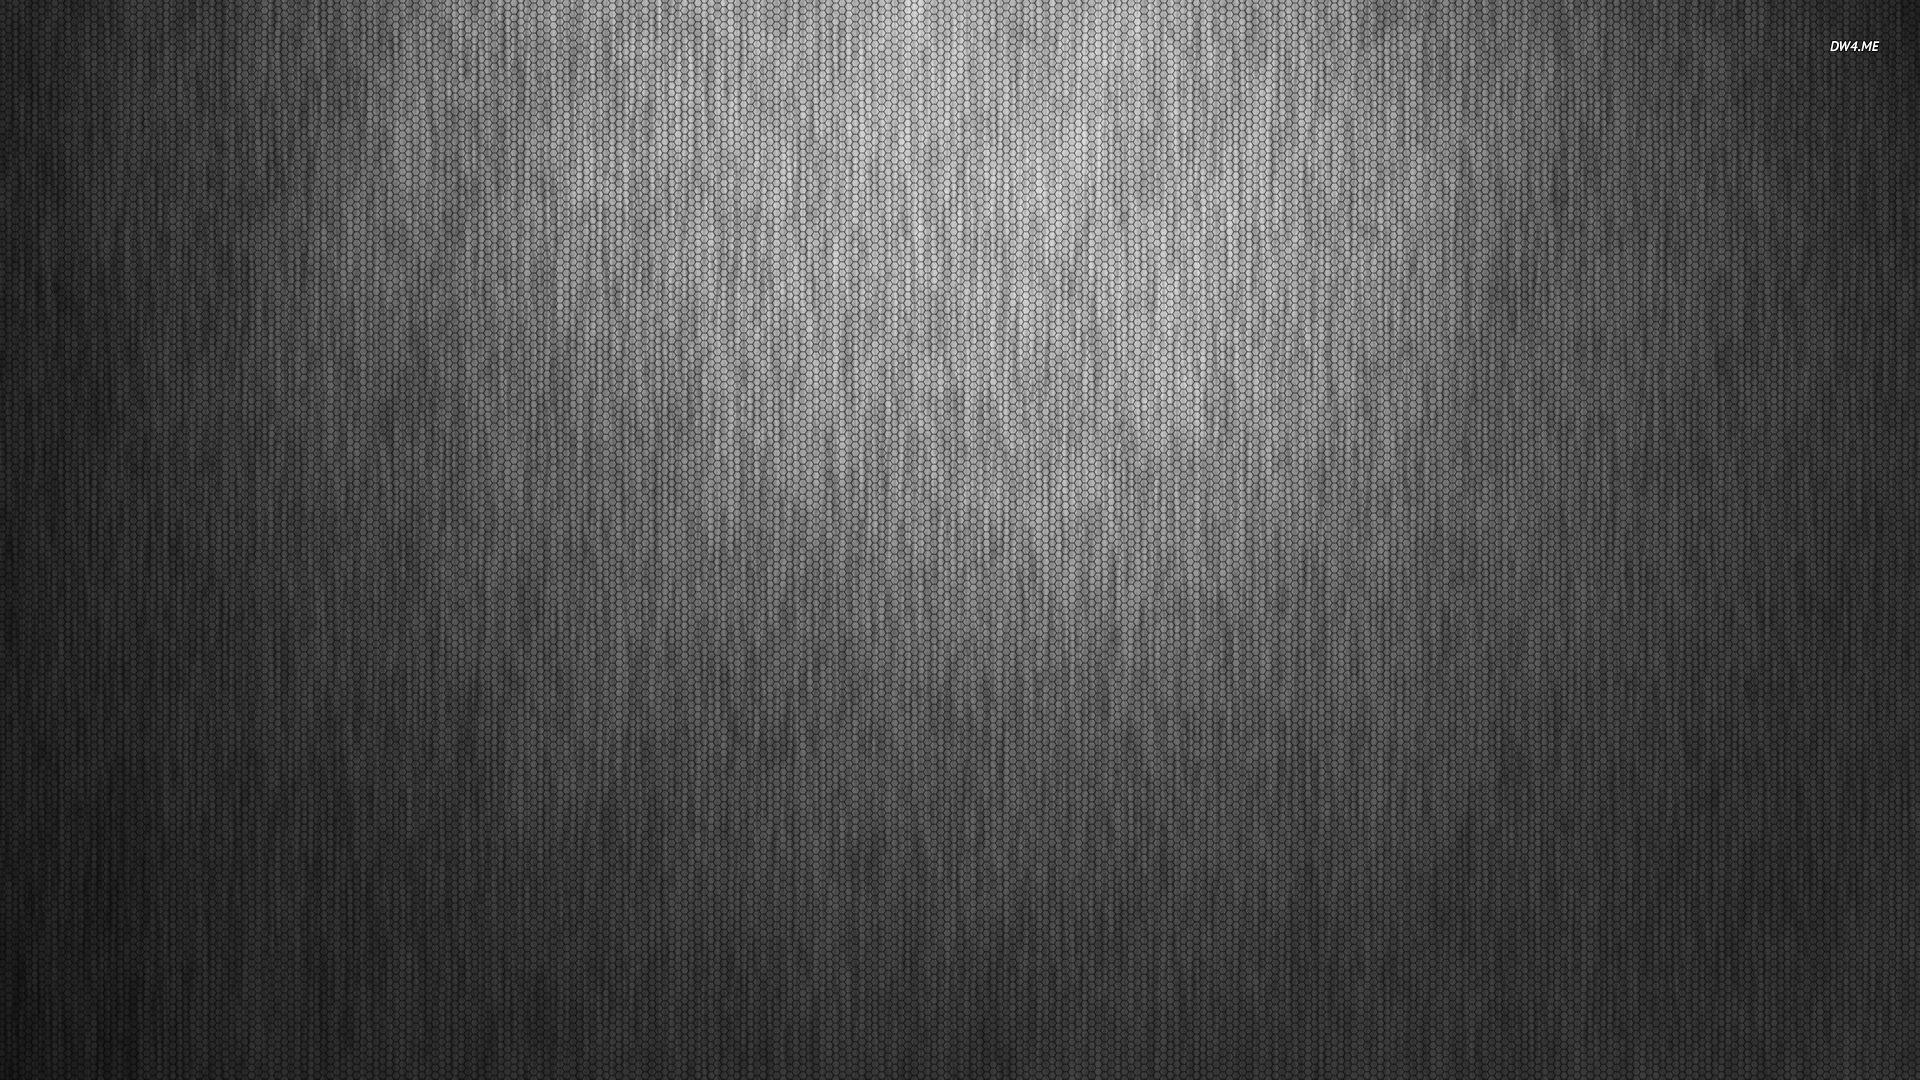 74 Rose Wallpaper For HD Download - Wonderful Engineering